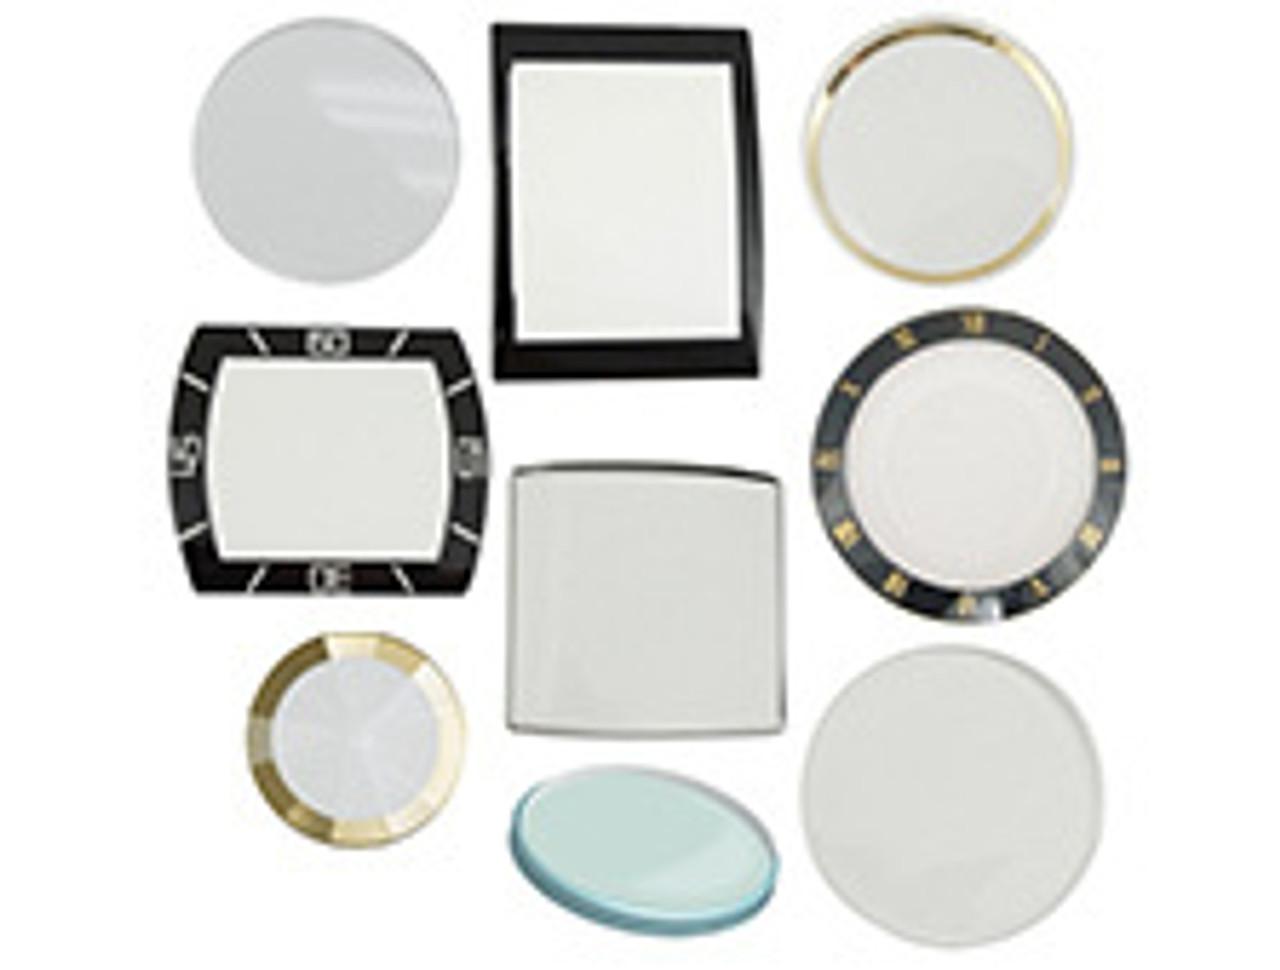 Watch Parts | Replacement Watch Supplies | Watch Repair Parts